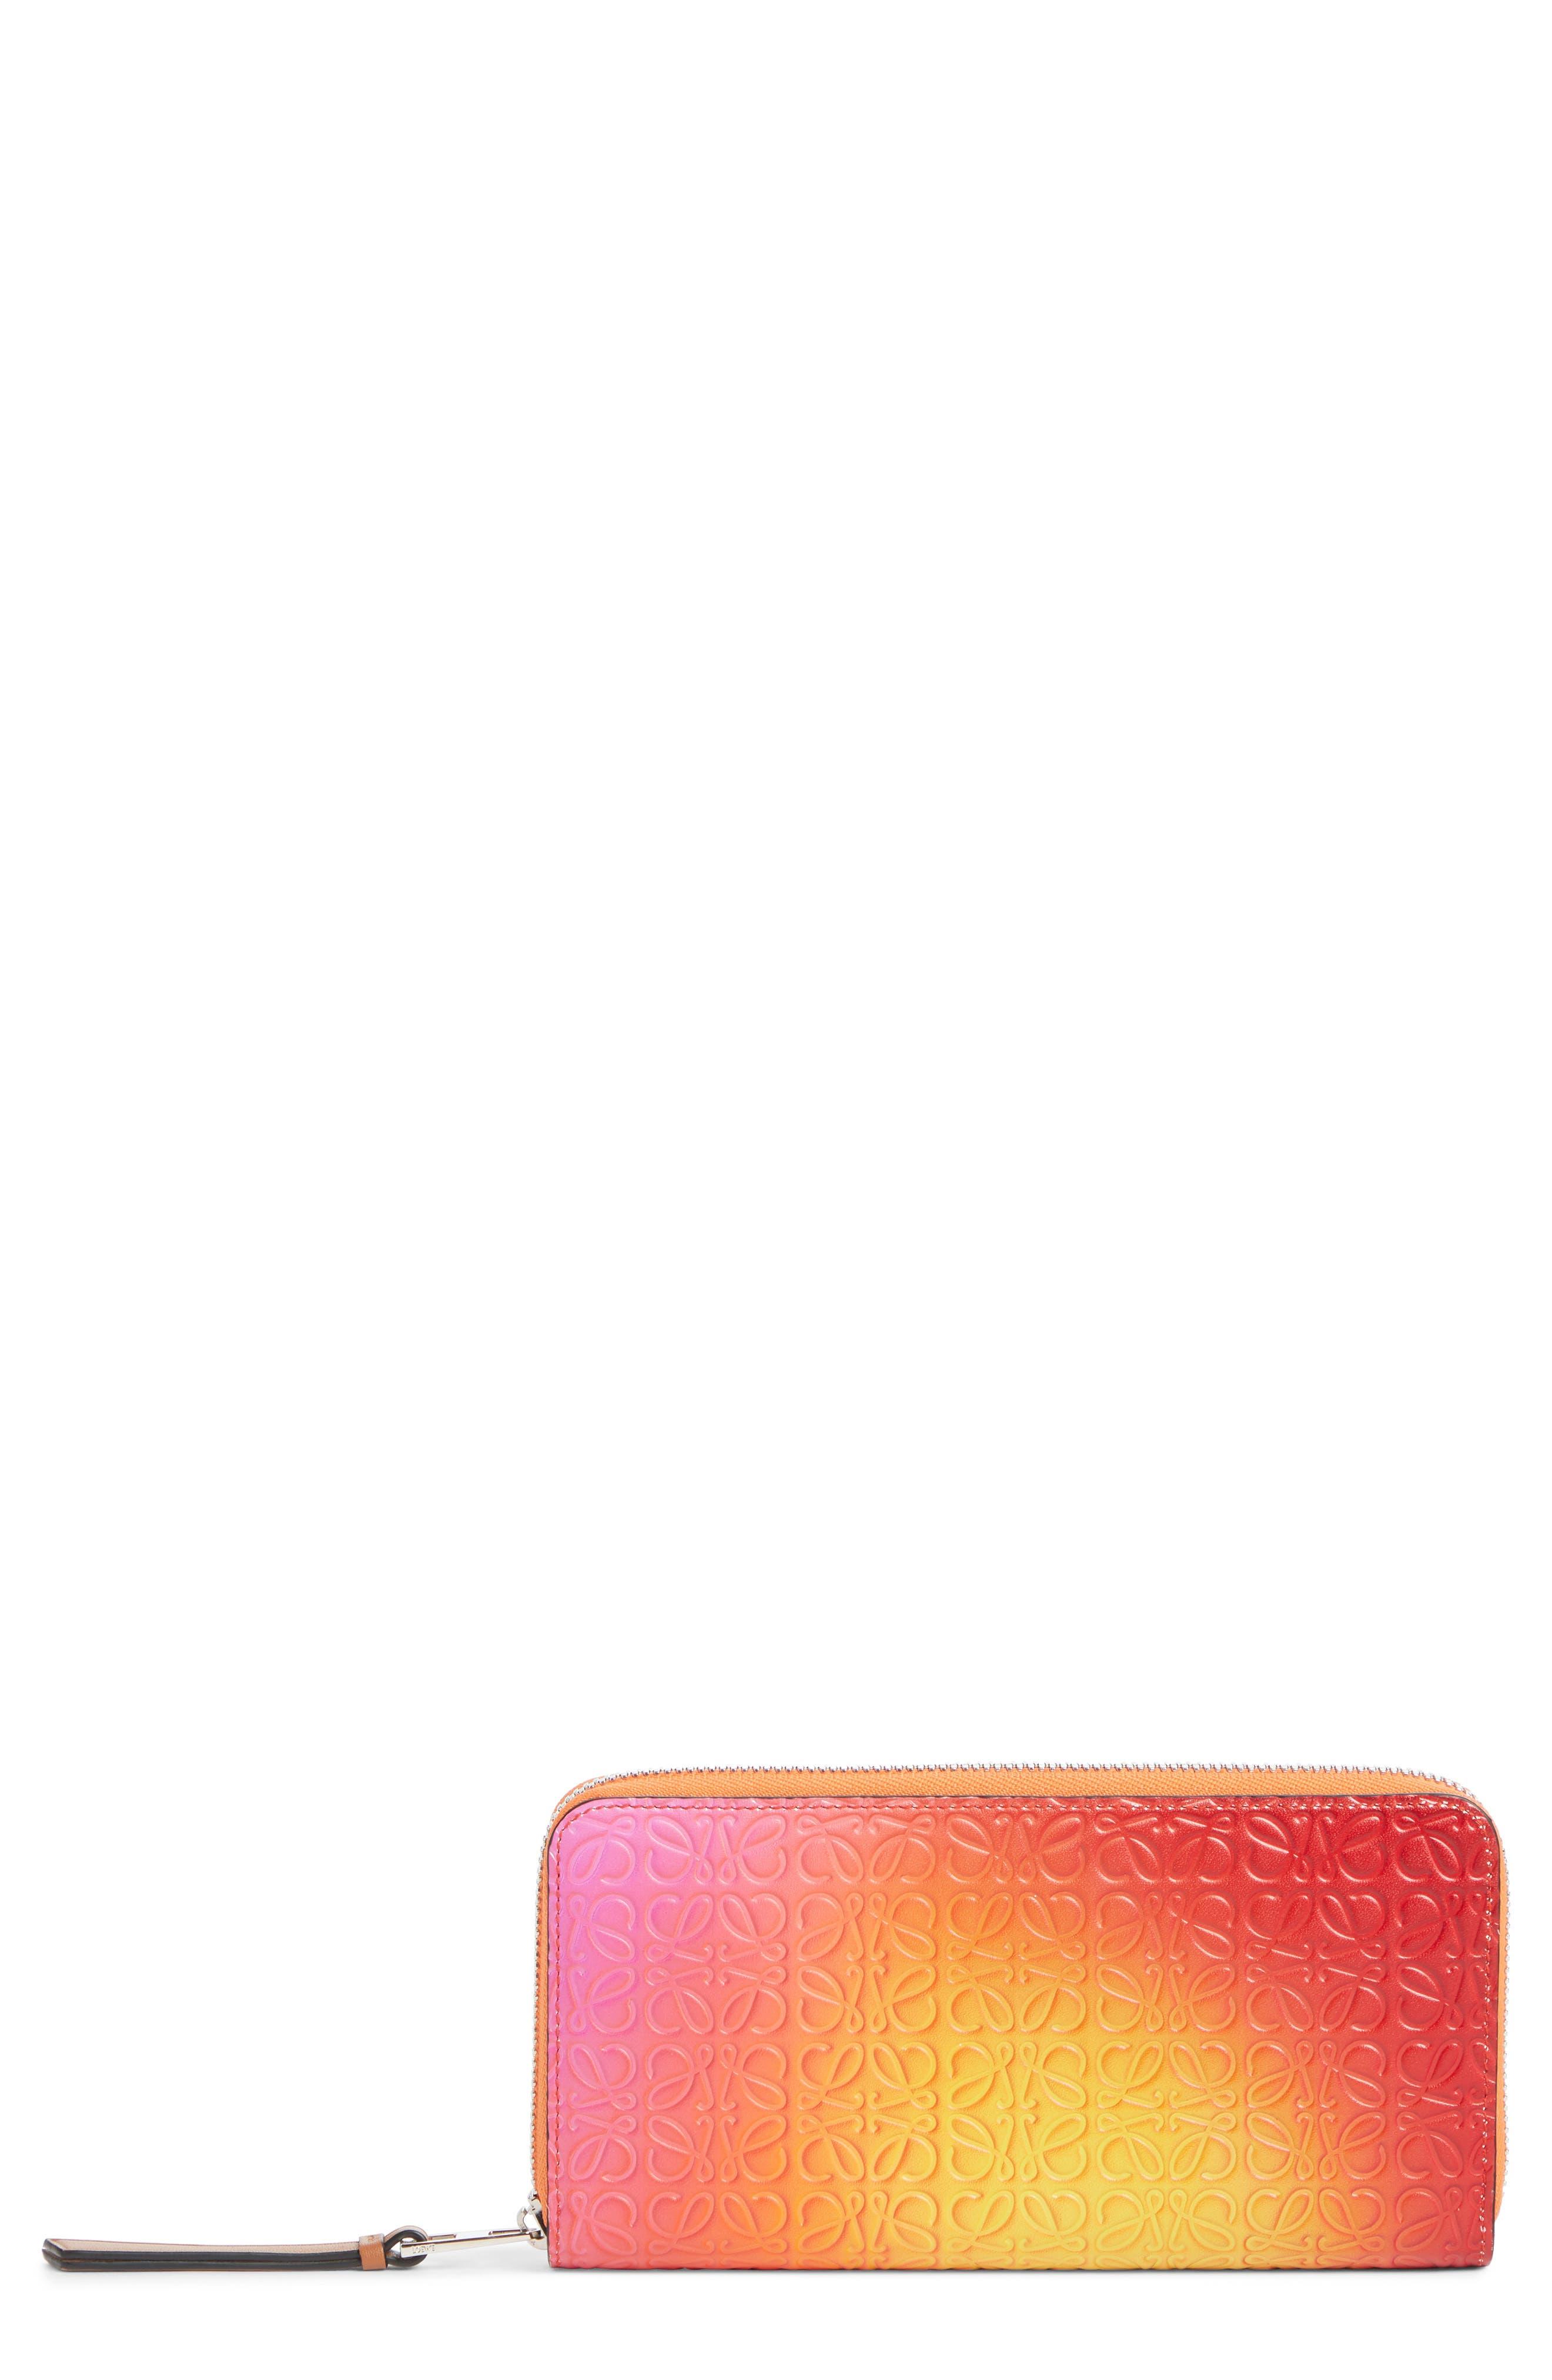 LOEWE Embossed Ombré Leather Zip Around Wallet, Main, color, ORANGE SUNSET